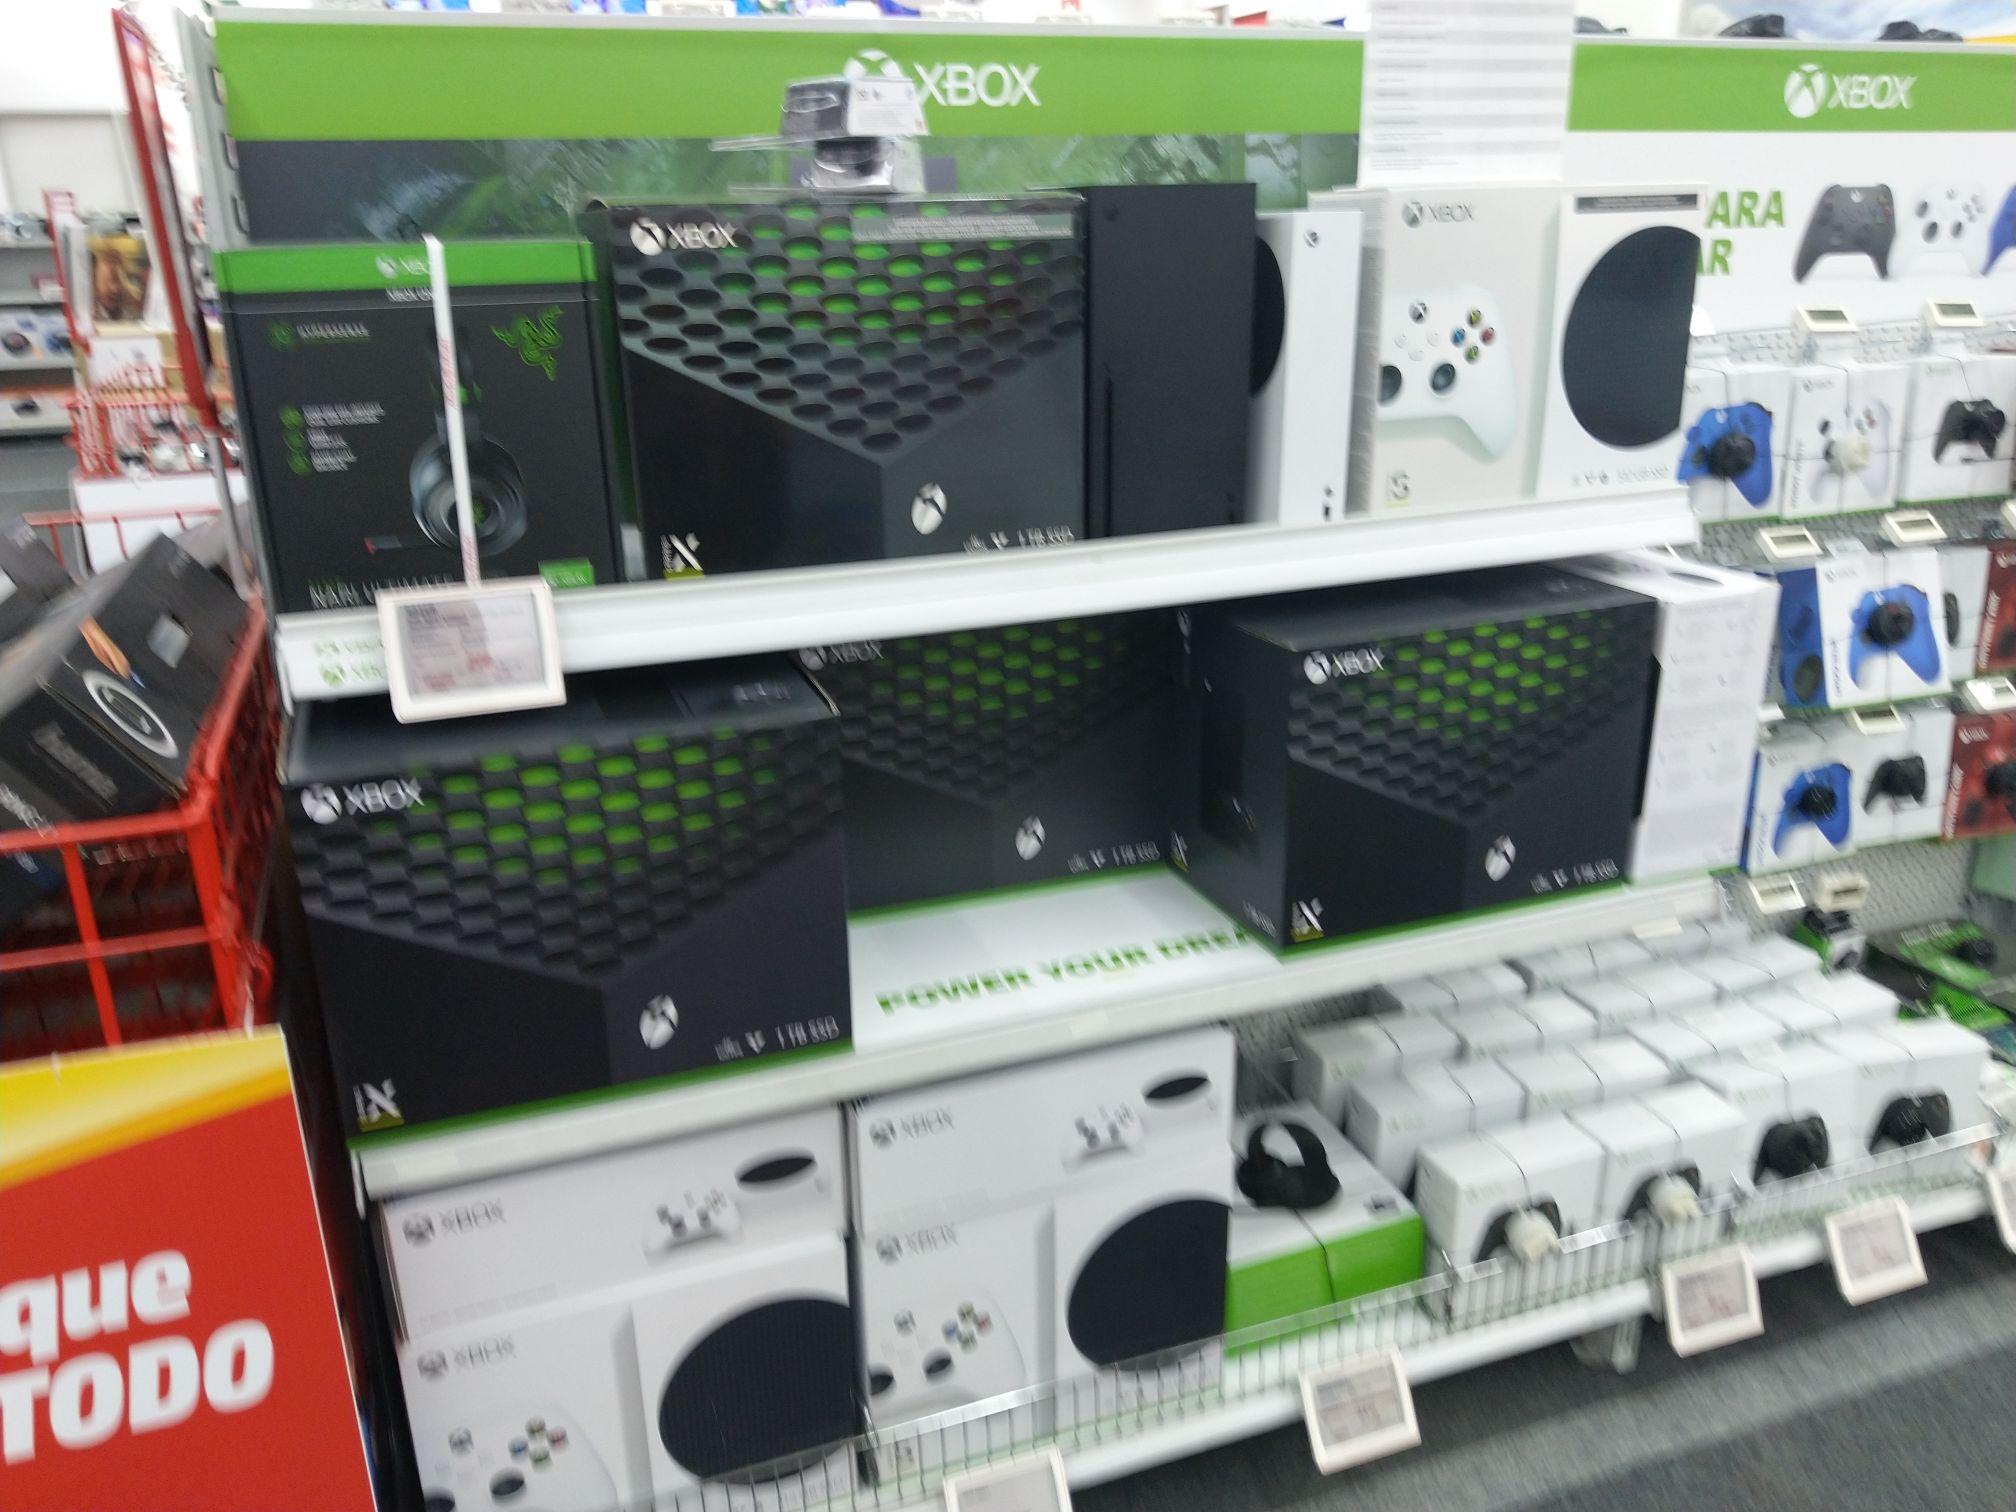 Xbox Series X Mediamarkt Madrid Paseo de la Castellana